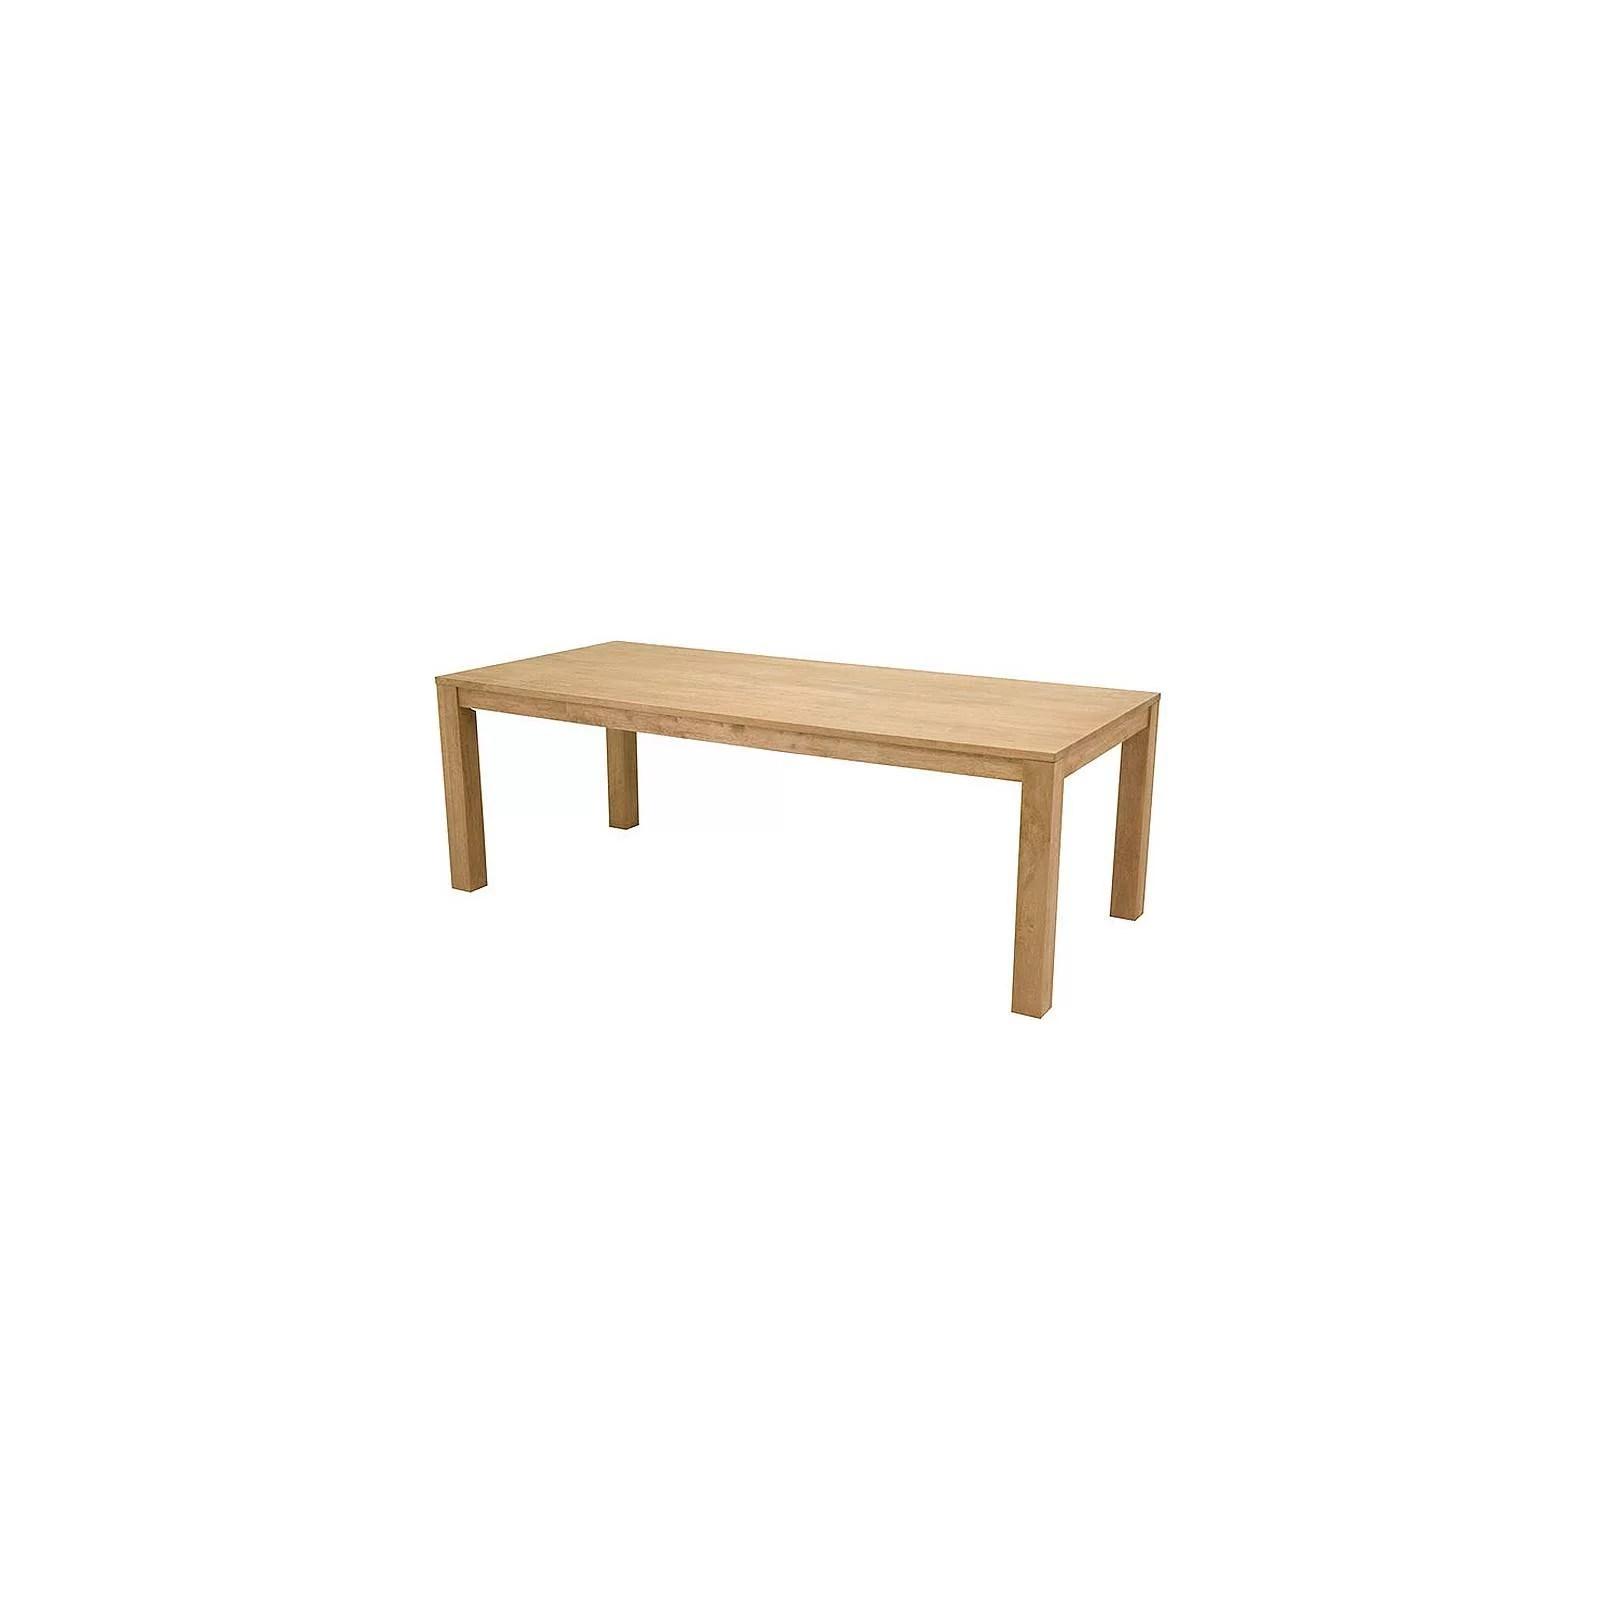 table bois massif et brut salle a manger